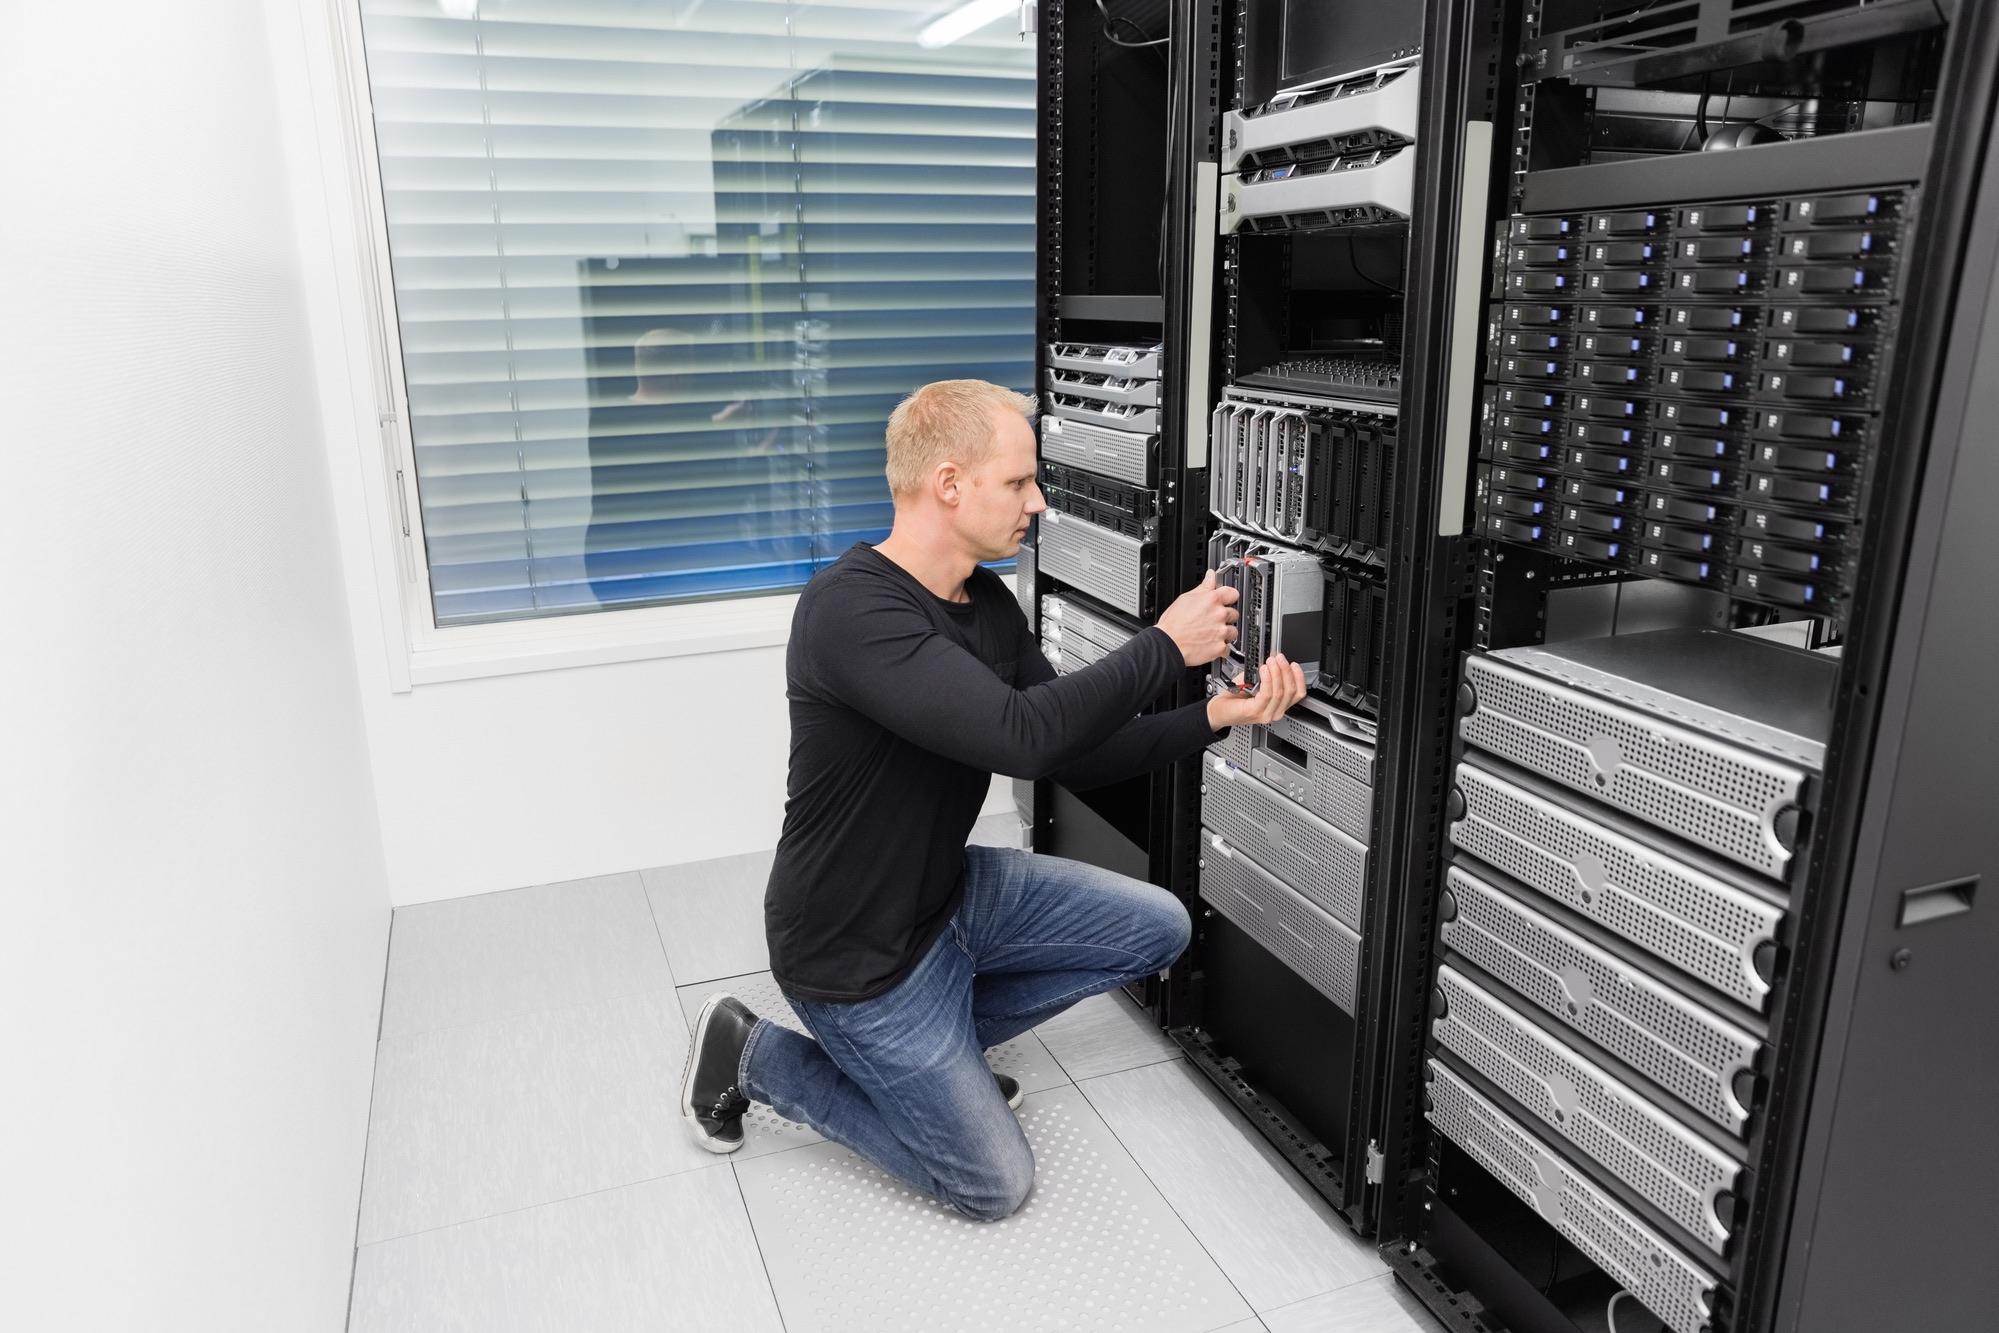 IT consultant working in datacenter